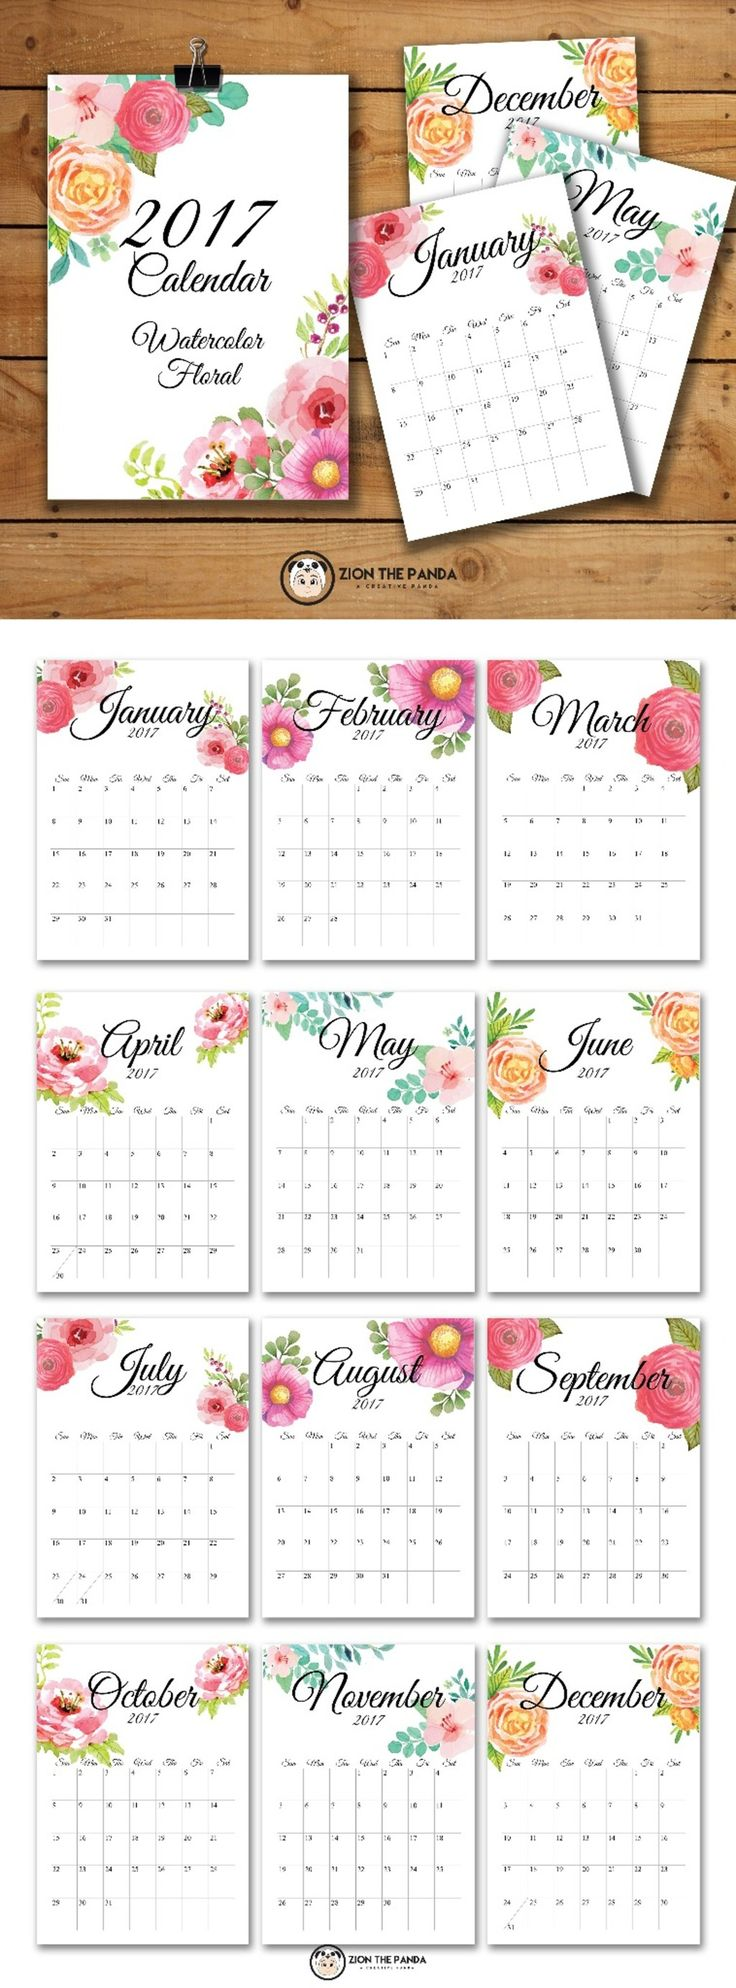 2017 Monthly Calendar - Floral (printable) - Zion The Panda                                                                                                                                                                                 More                                                                                                                                                                                 Mais